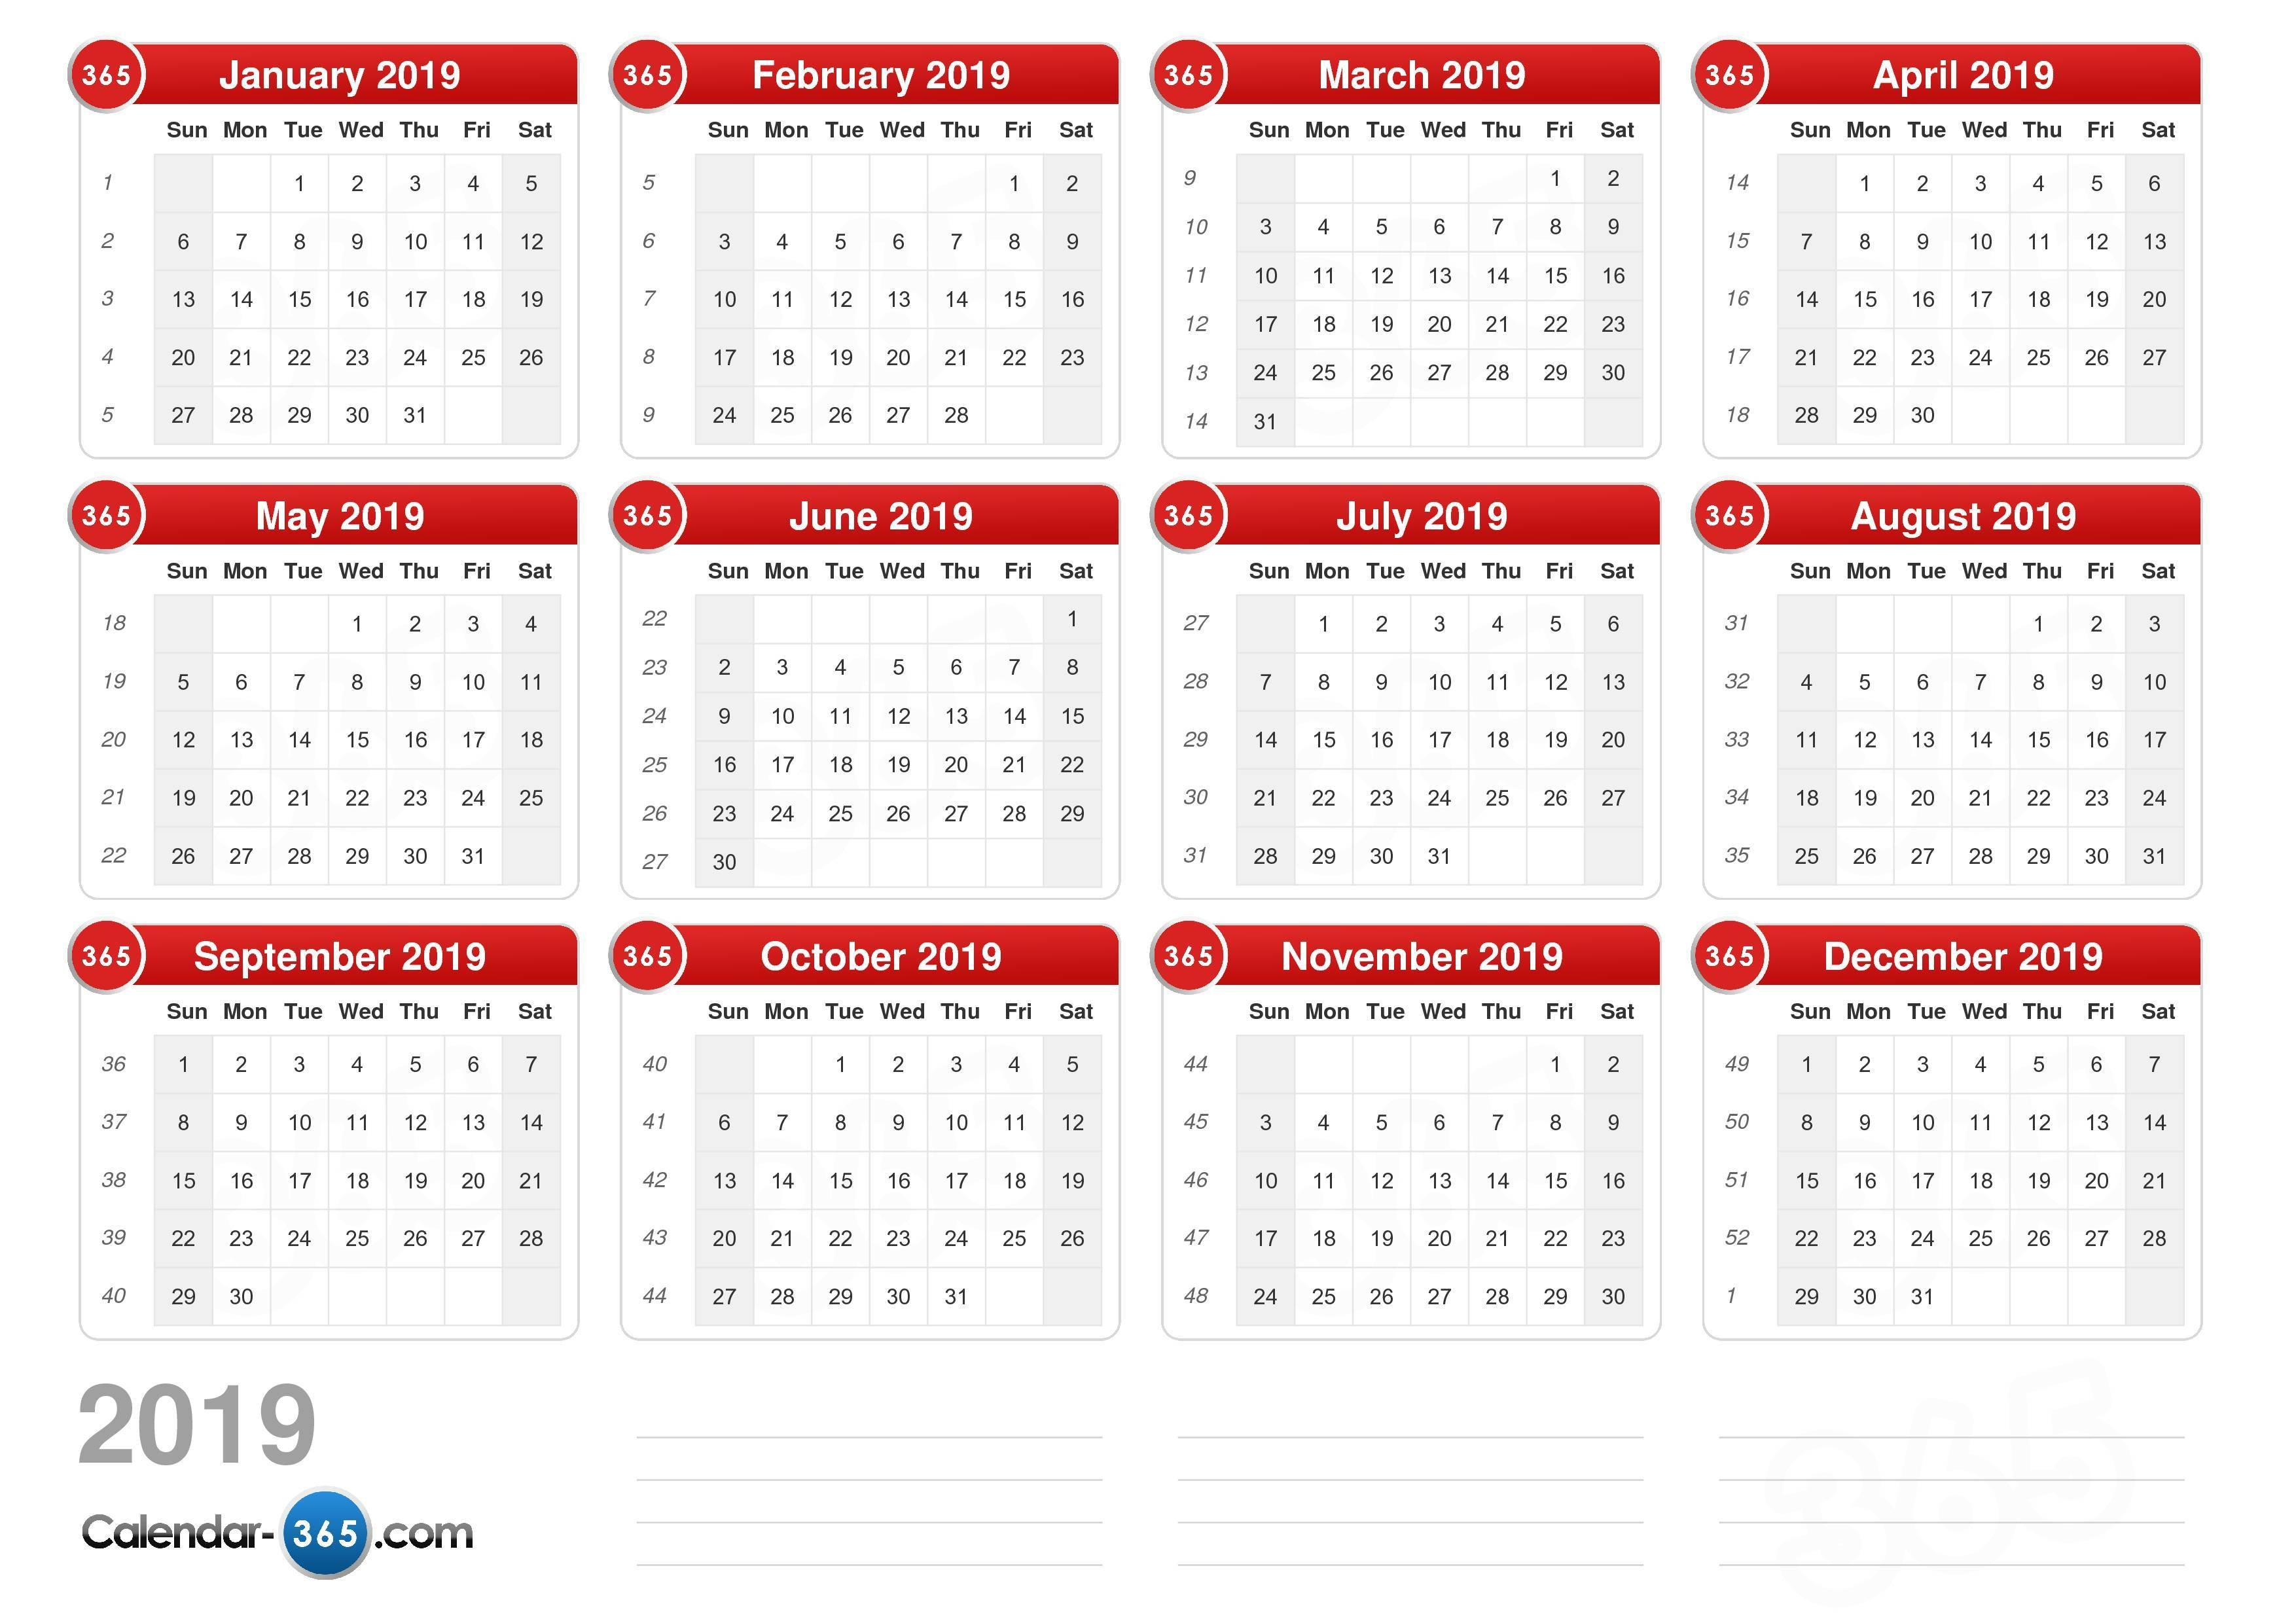 2019 Calendar Calendar E N 2019